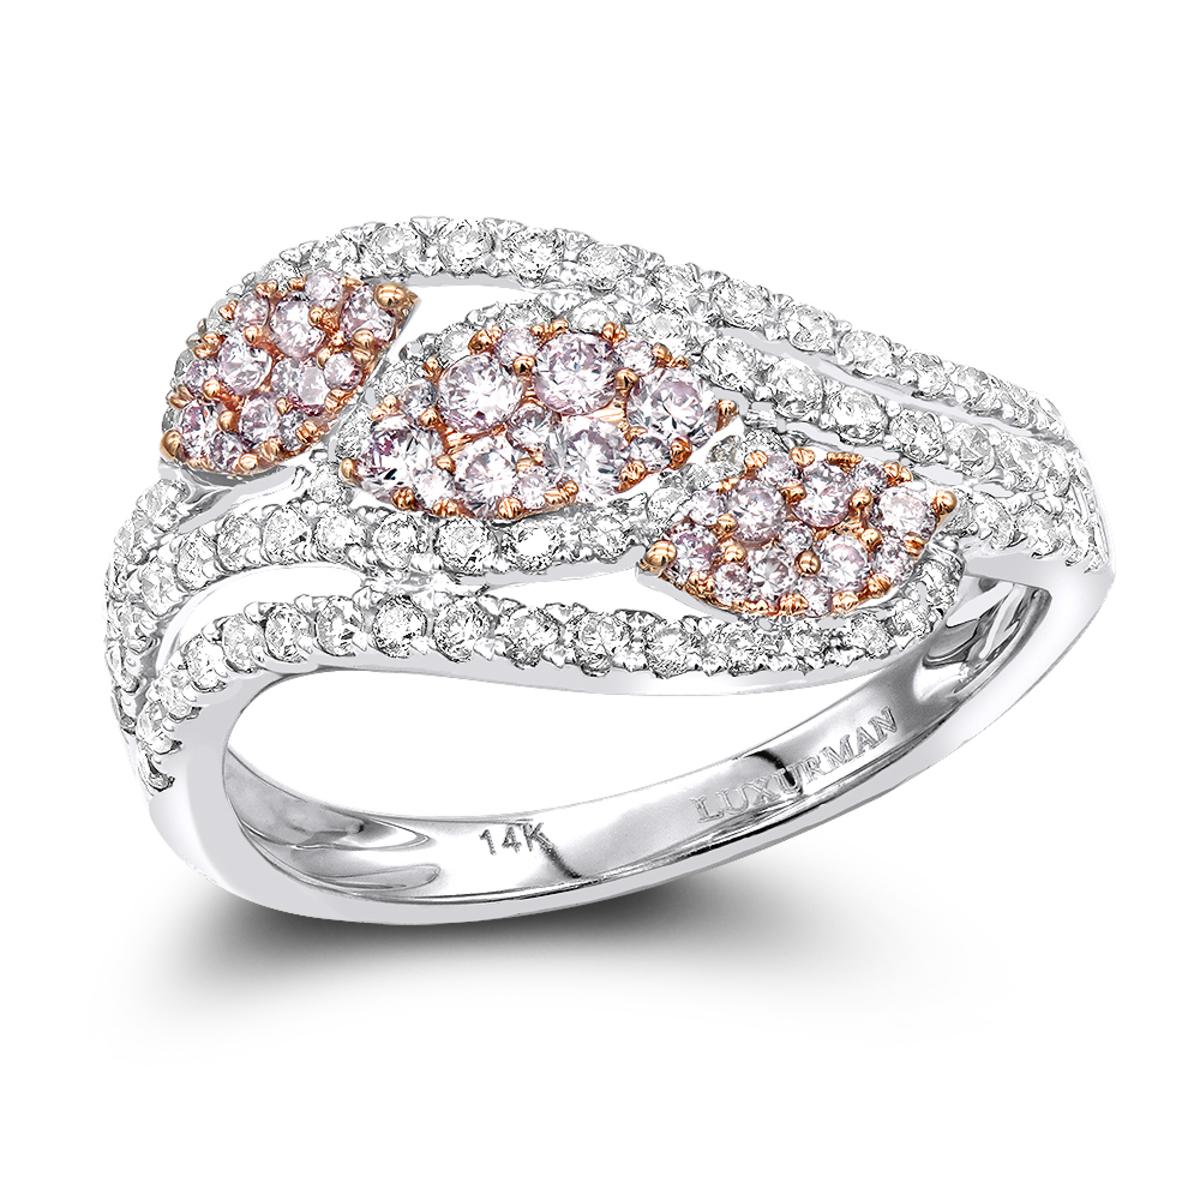 Designer Cocktail Rings 14K Gold White Pink Diamond Leafs Ring for Women 1c